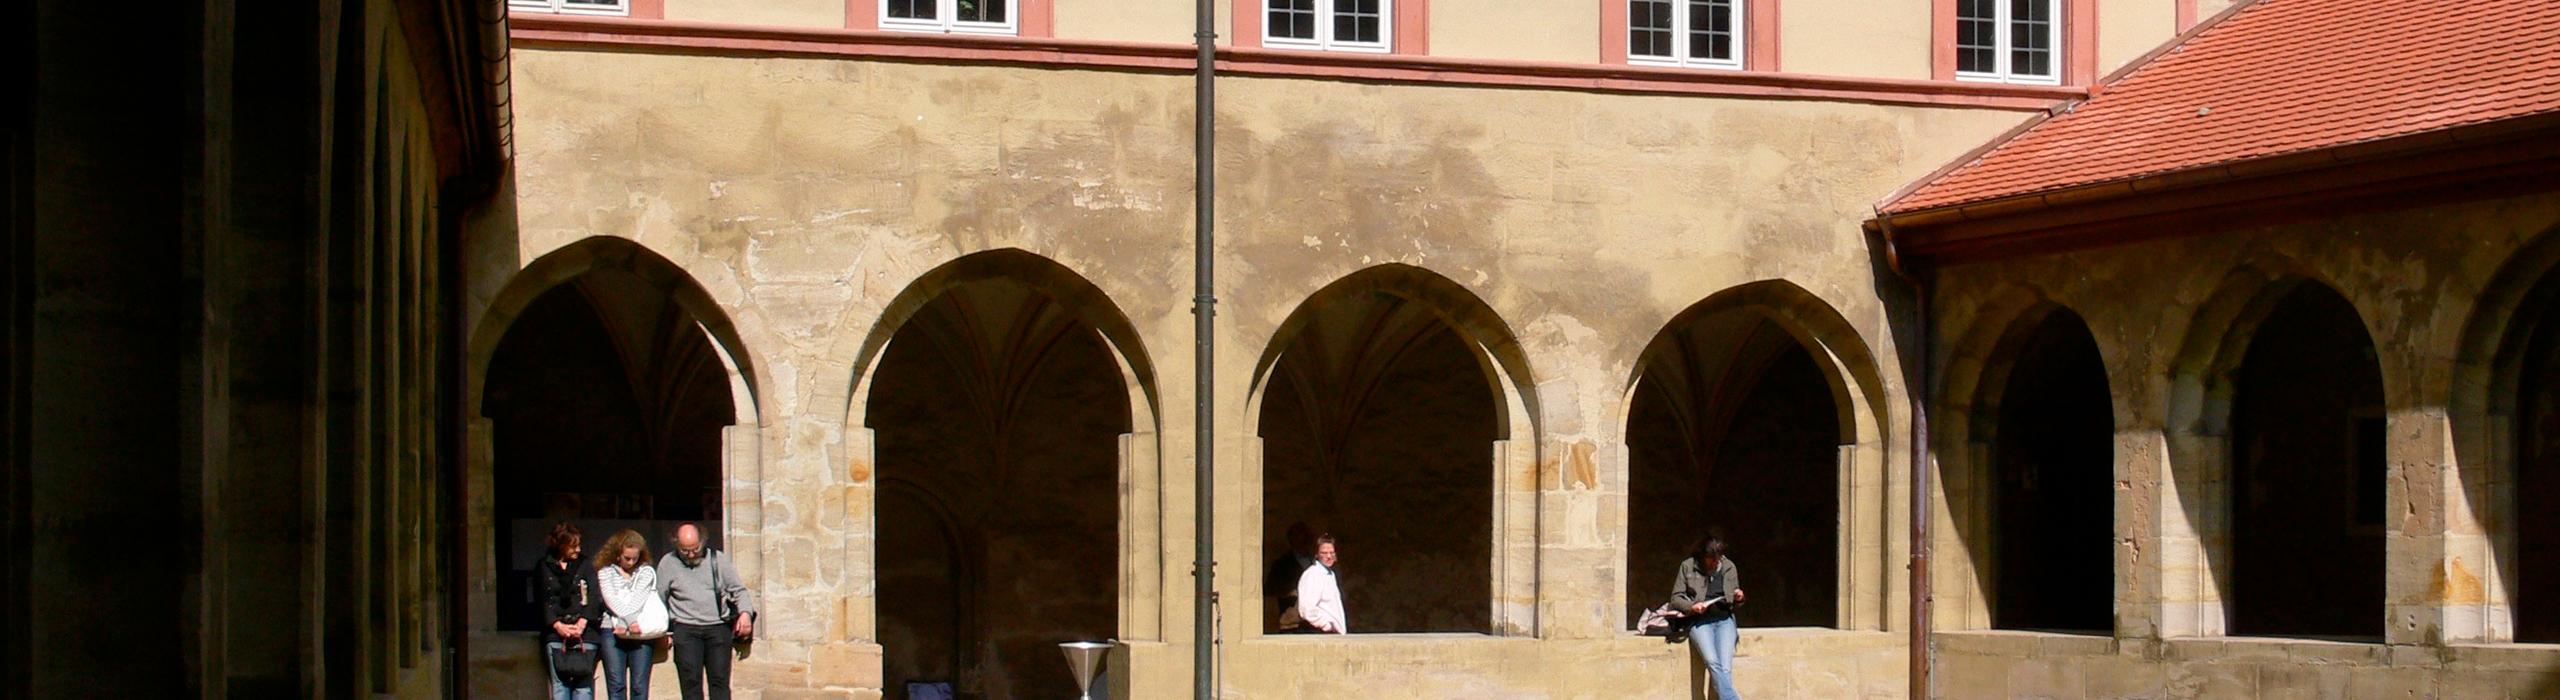 Ehemaliges Dominikanerkloster